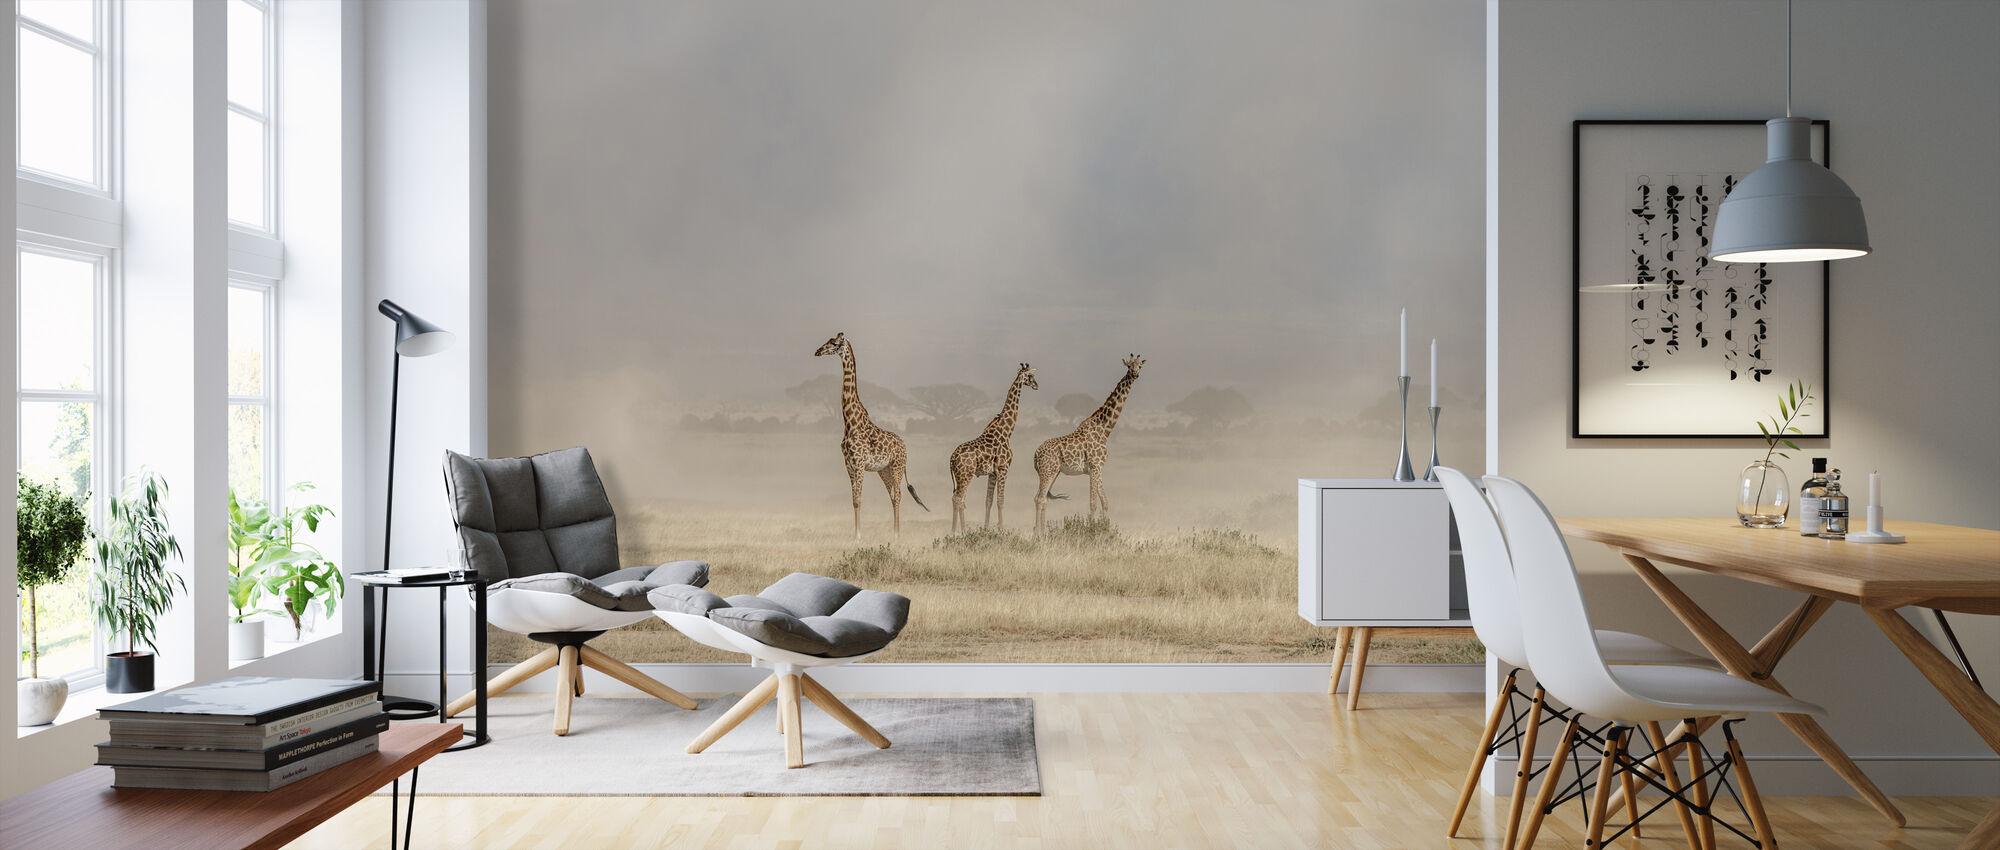 Weathering the Amboseli Dust Devils - Wallpaper - Living Room